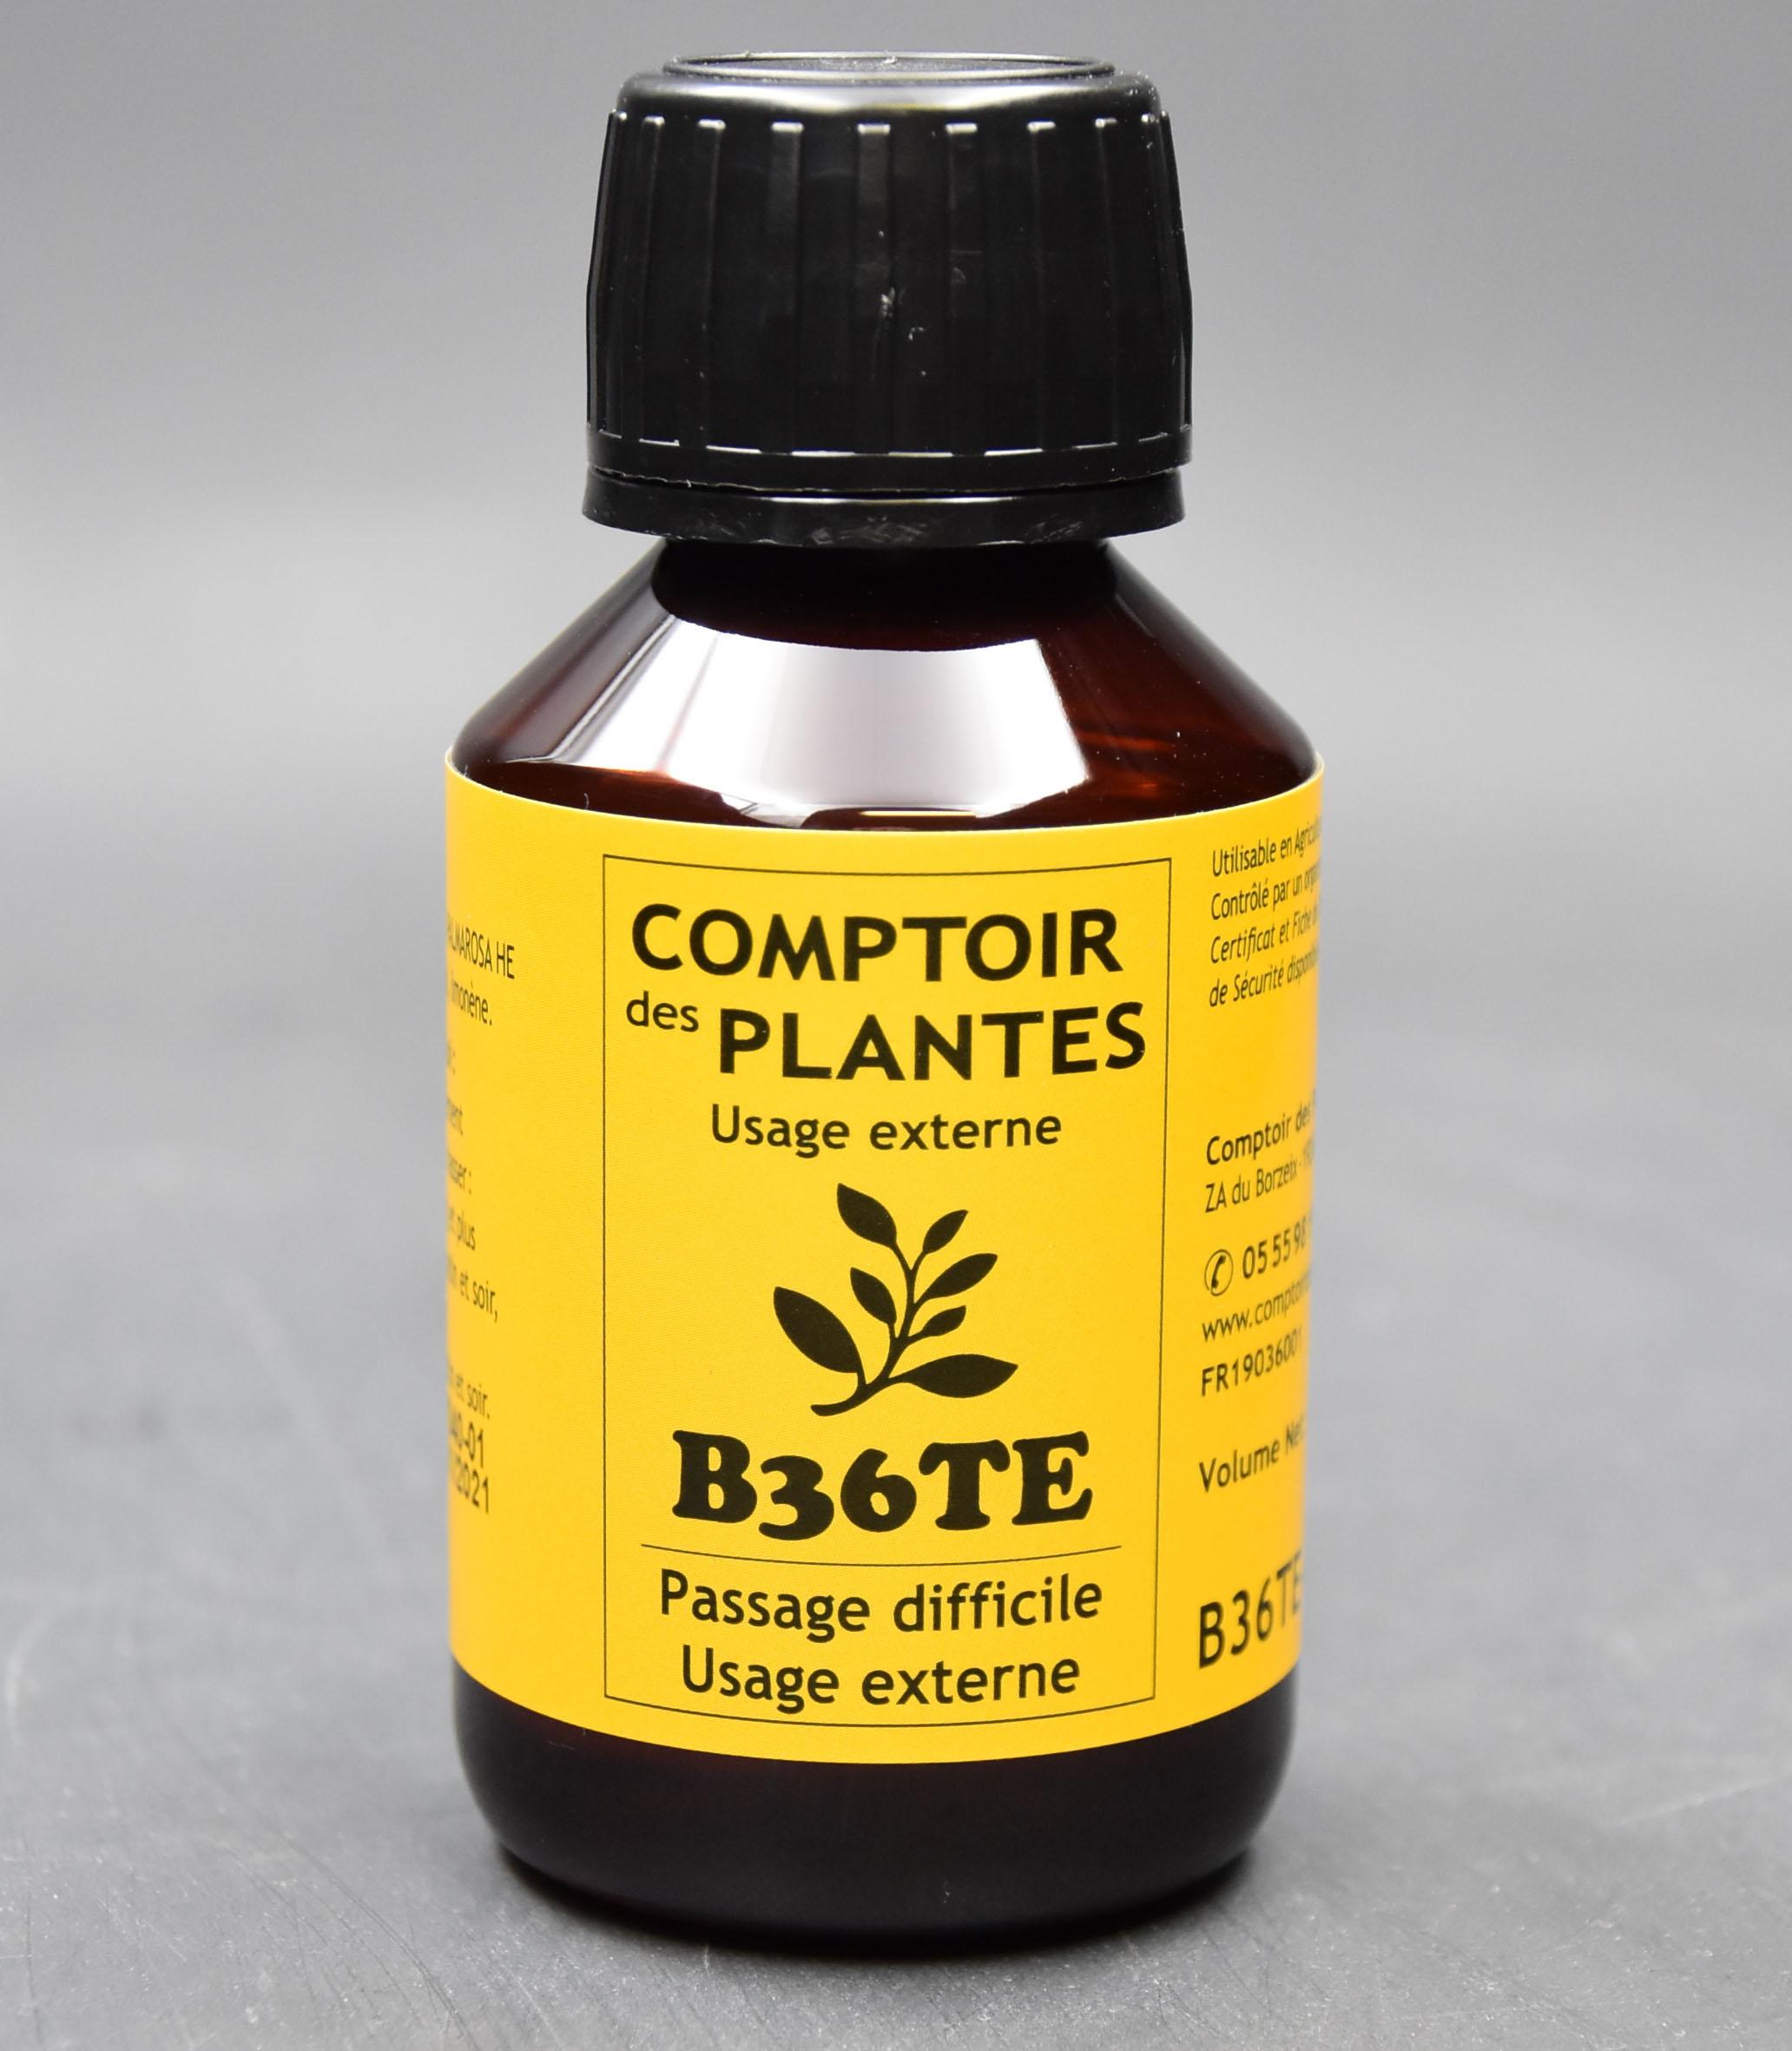 Traitement mammite, infection, arthrite - Bovin vache